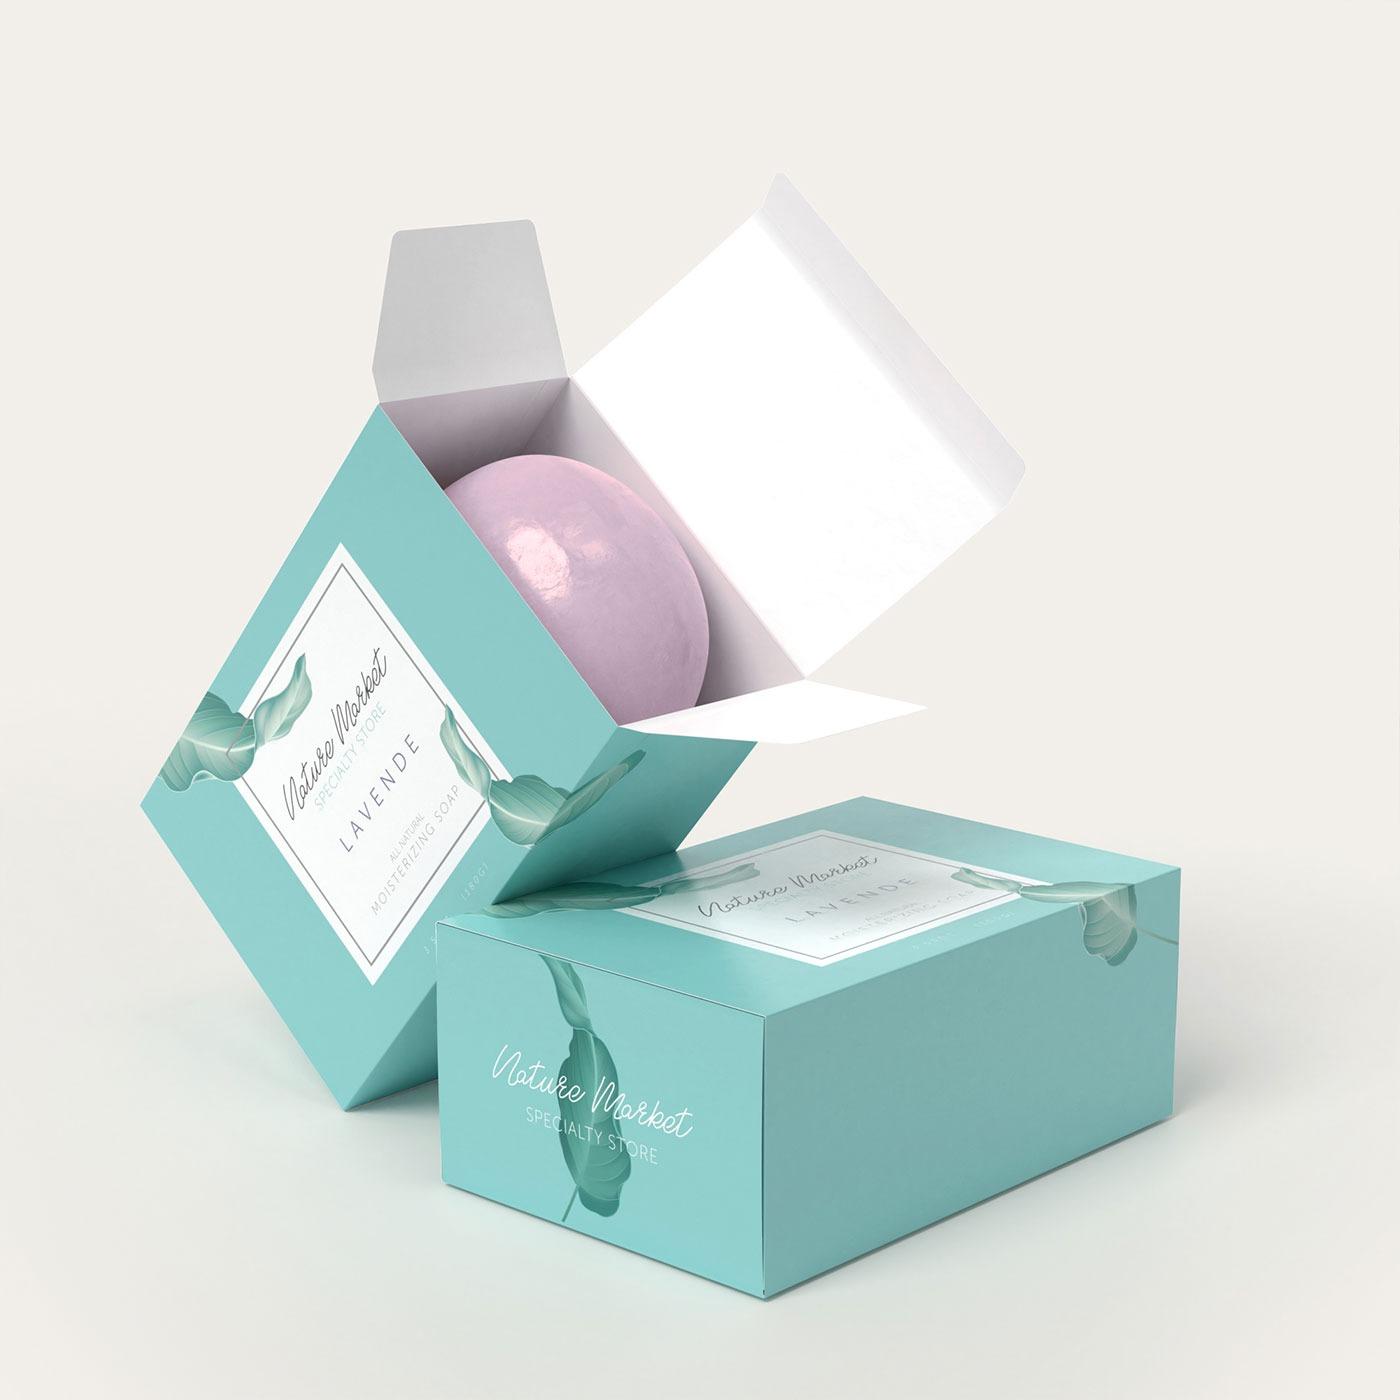 Custom Handmade Soap Packaging